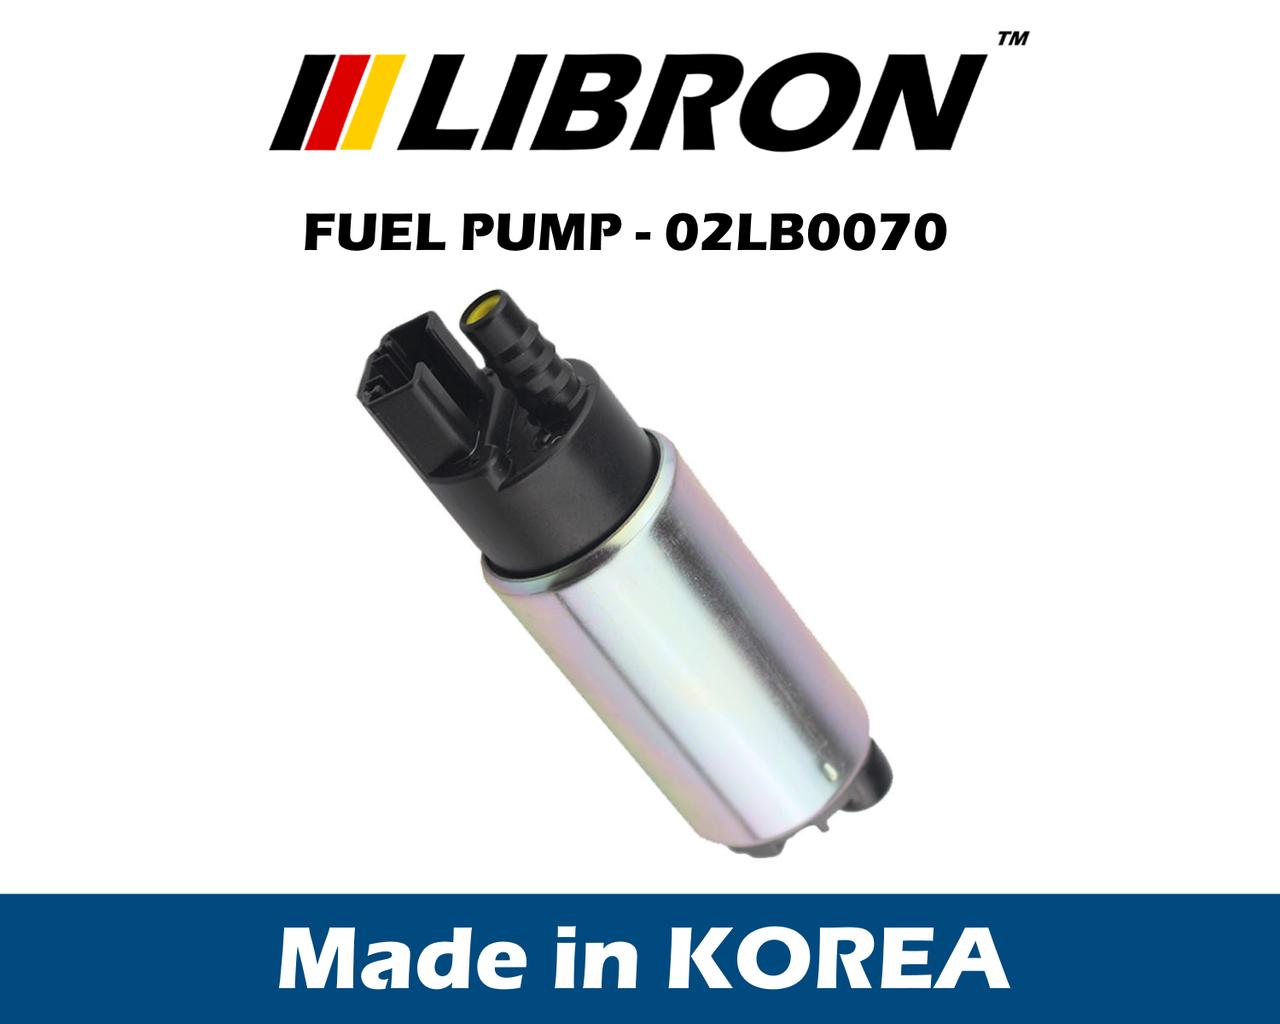 Топливный насос LIBRON 02LB0070 - MITSUBISHI GALANT IV седан (1988-1992)